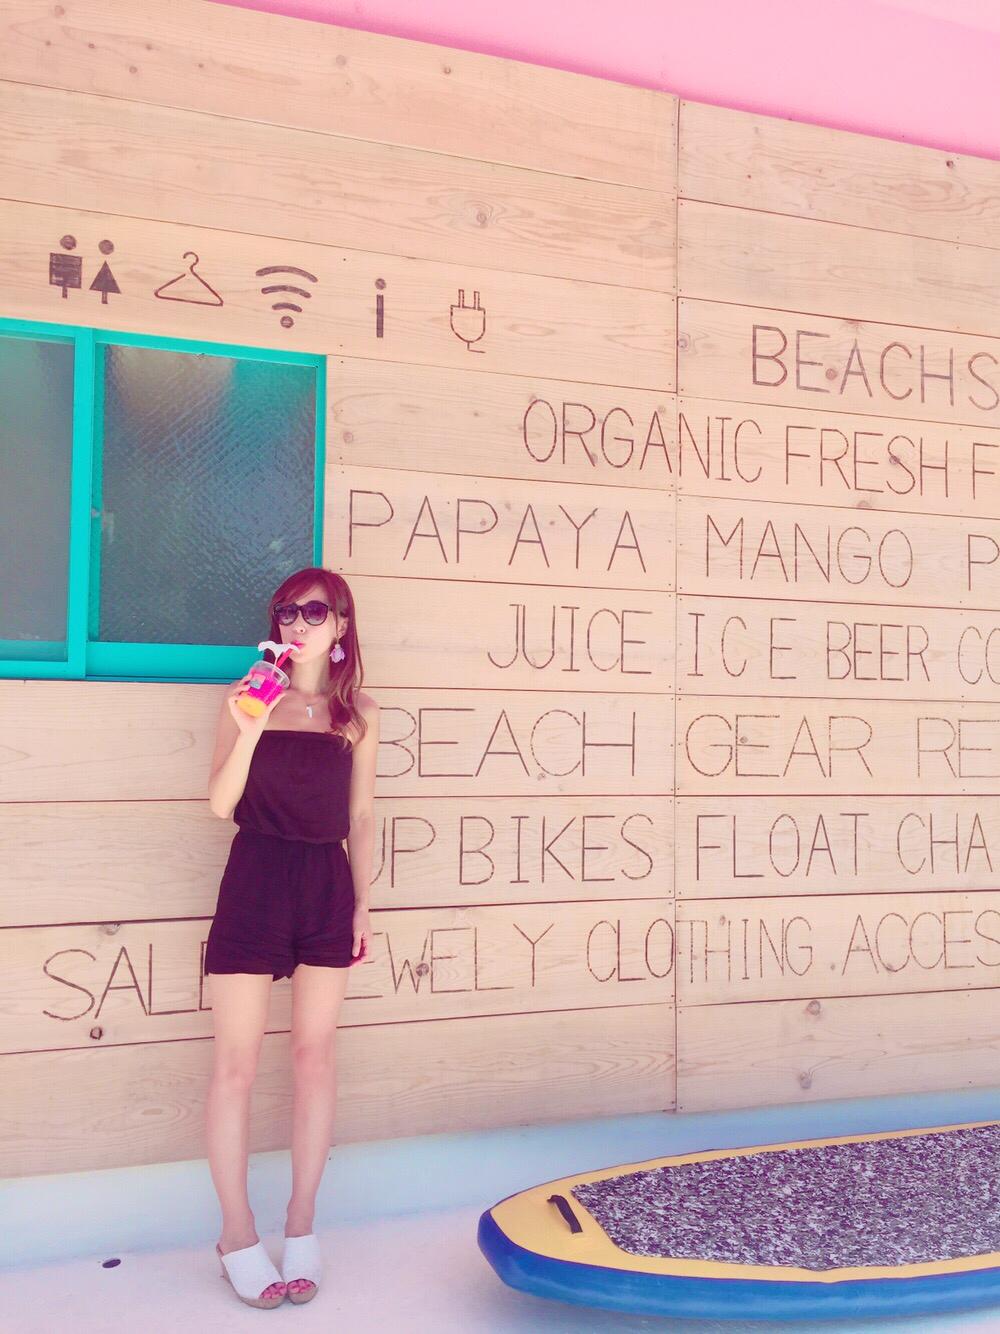 【TRIP】ほんとうは教えたくない!超フォトジェニック♡沖縄で1番すきなカフェ♡ MAGENTA n blue ♡_3